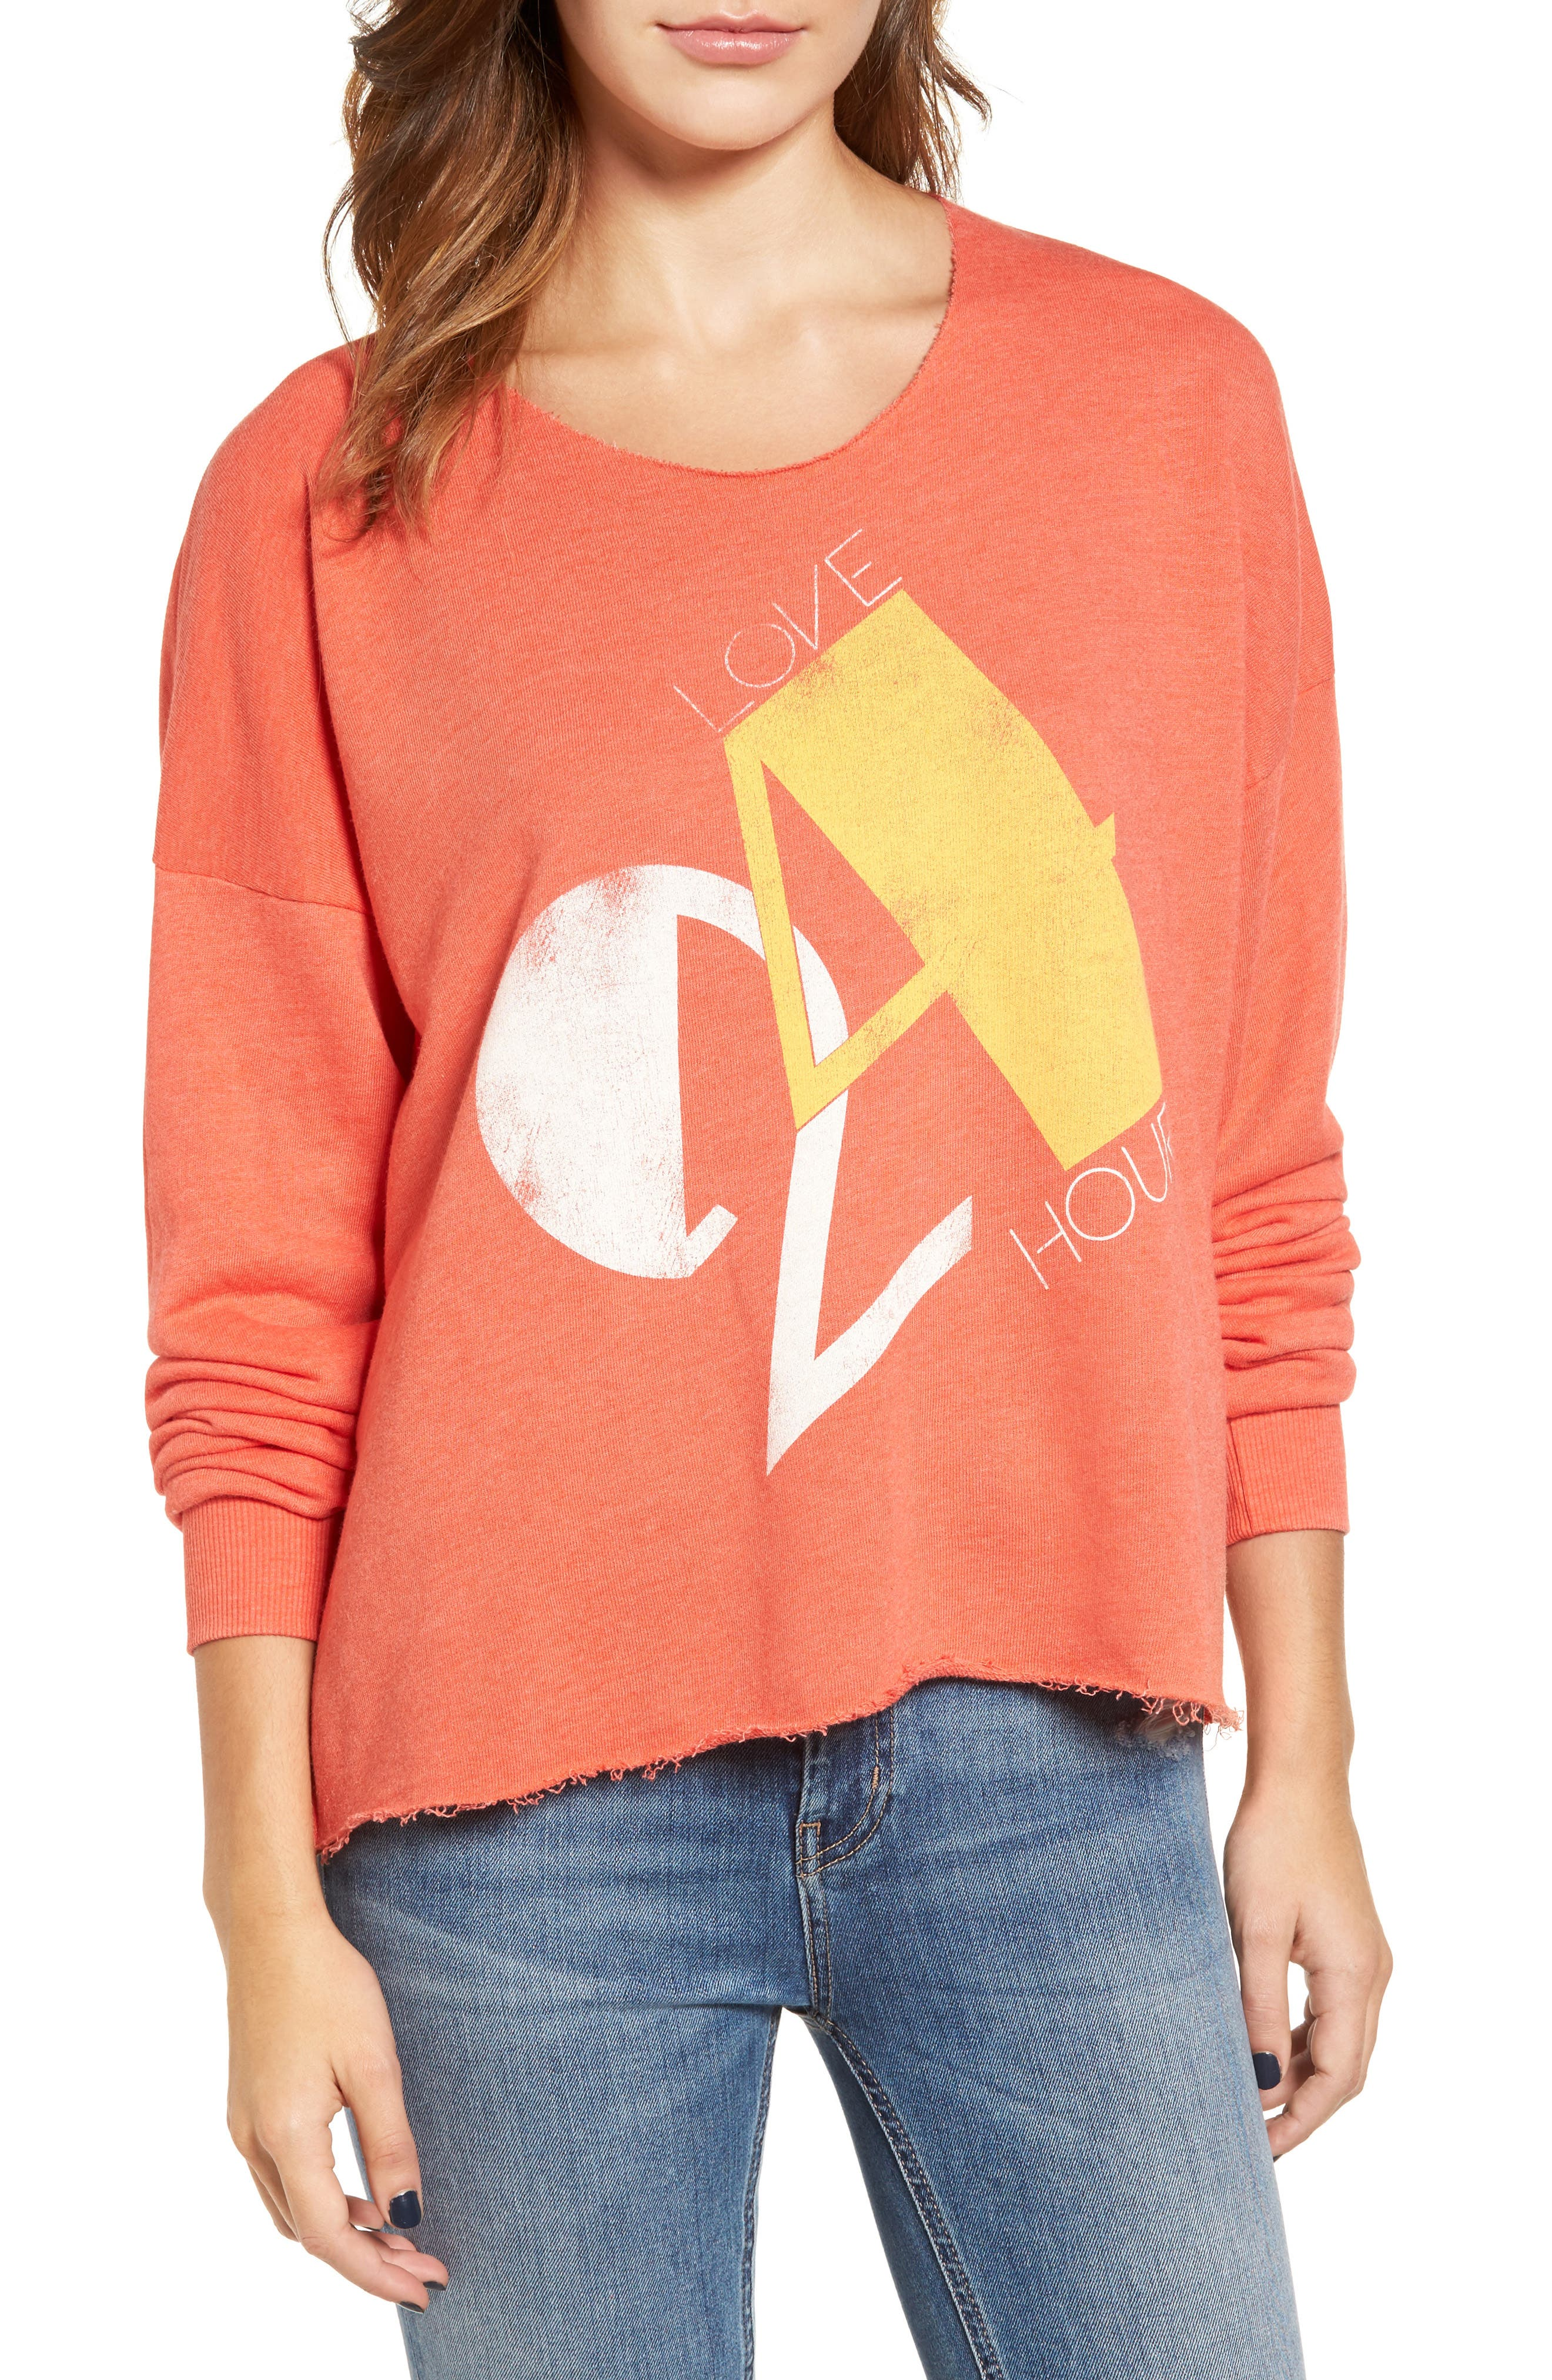 Love 24/7 Sweatshirt,                             Main thumbnail 1, color,                             640